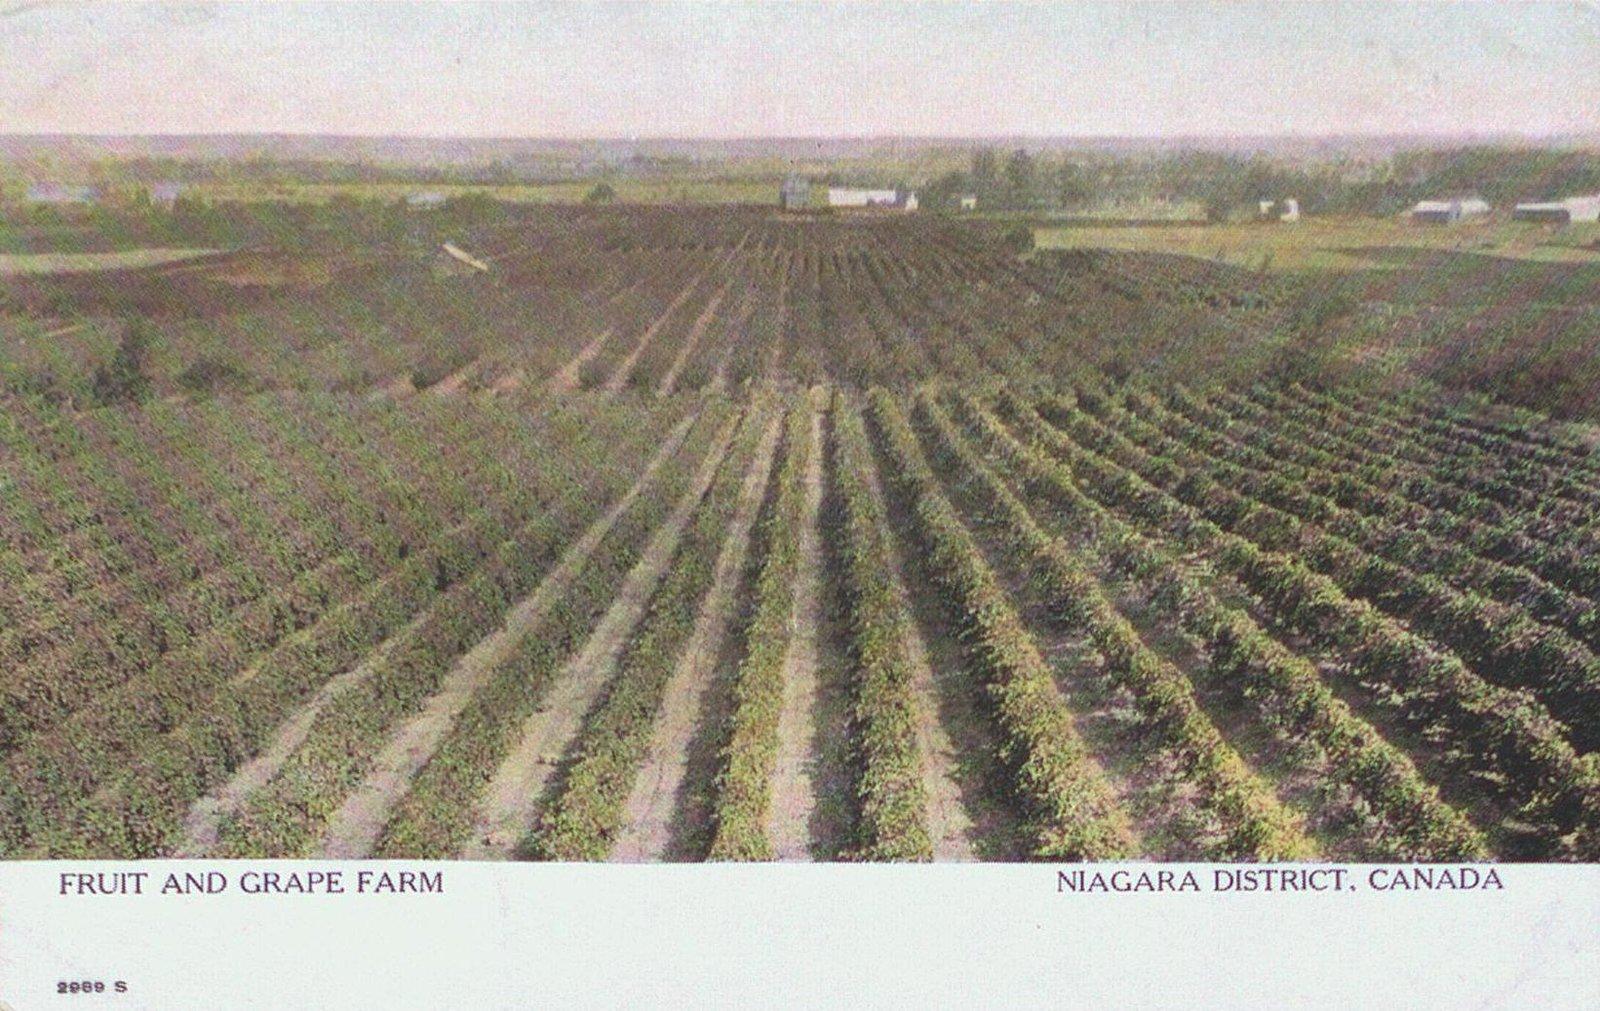 Fruit and Grape Farm, Niagara District